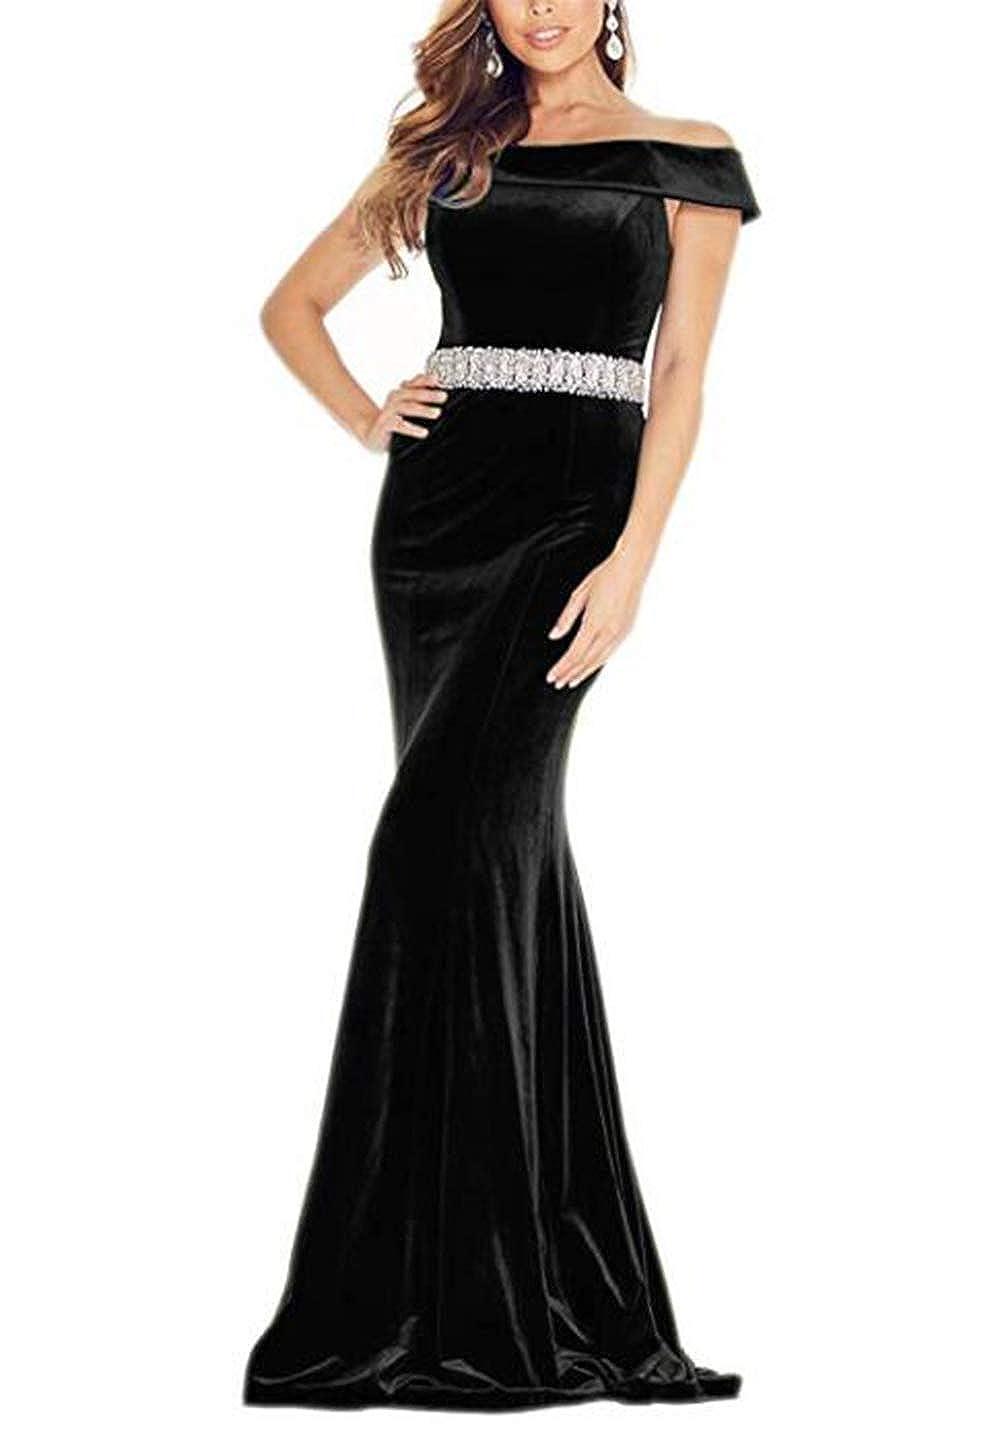 Black alilith.Z Off The Shoulder Mermiad Velvet Prom Dresses Long Formal Evening Dresses for Women with Beaded Belt